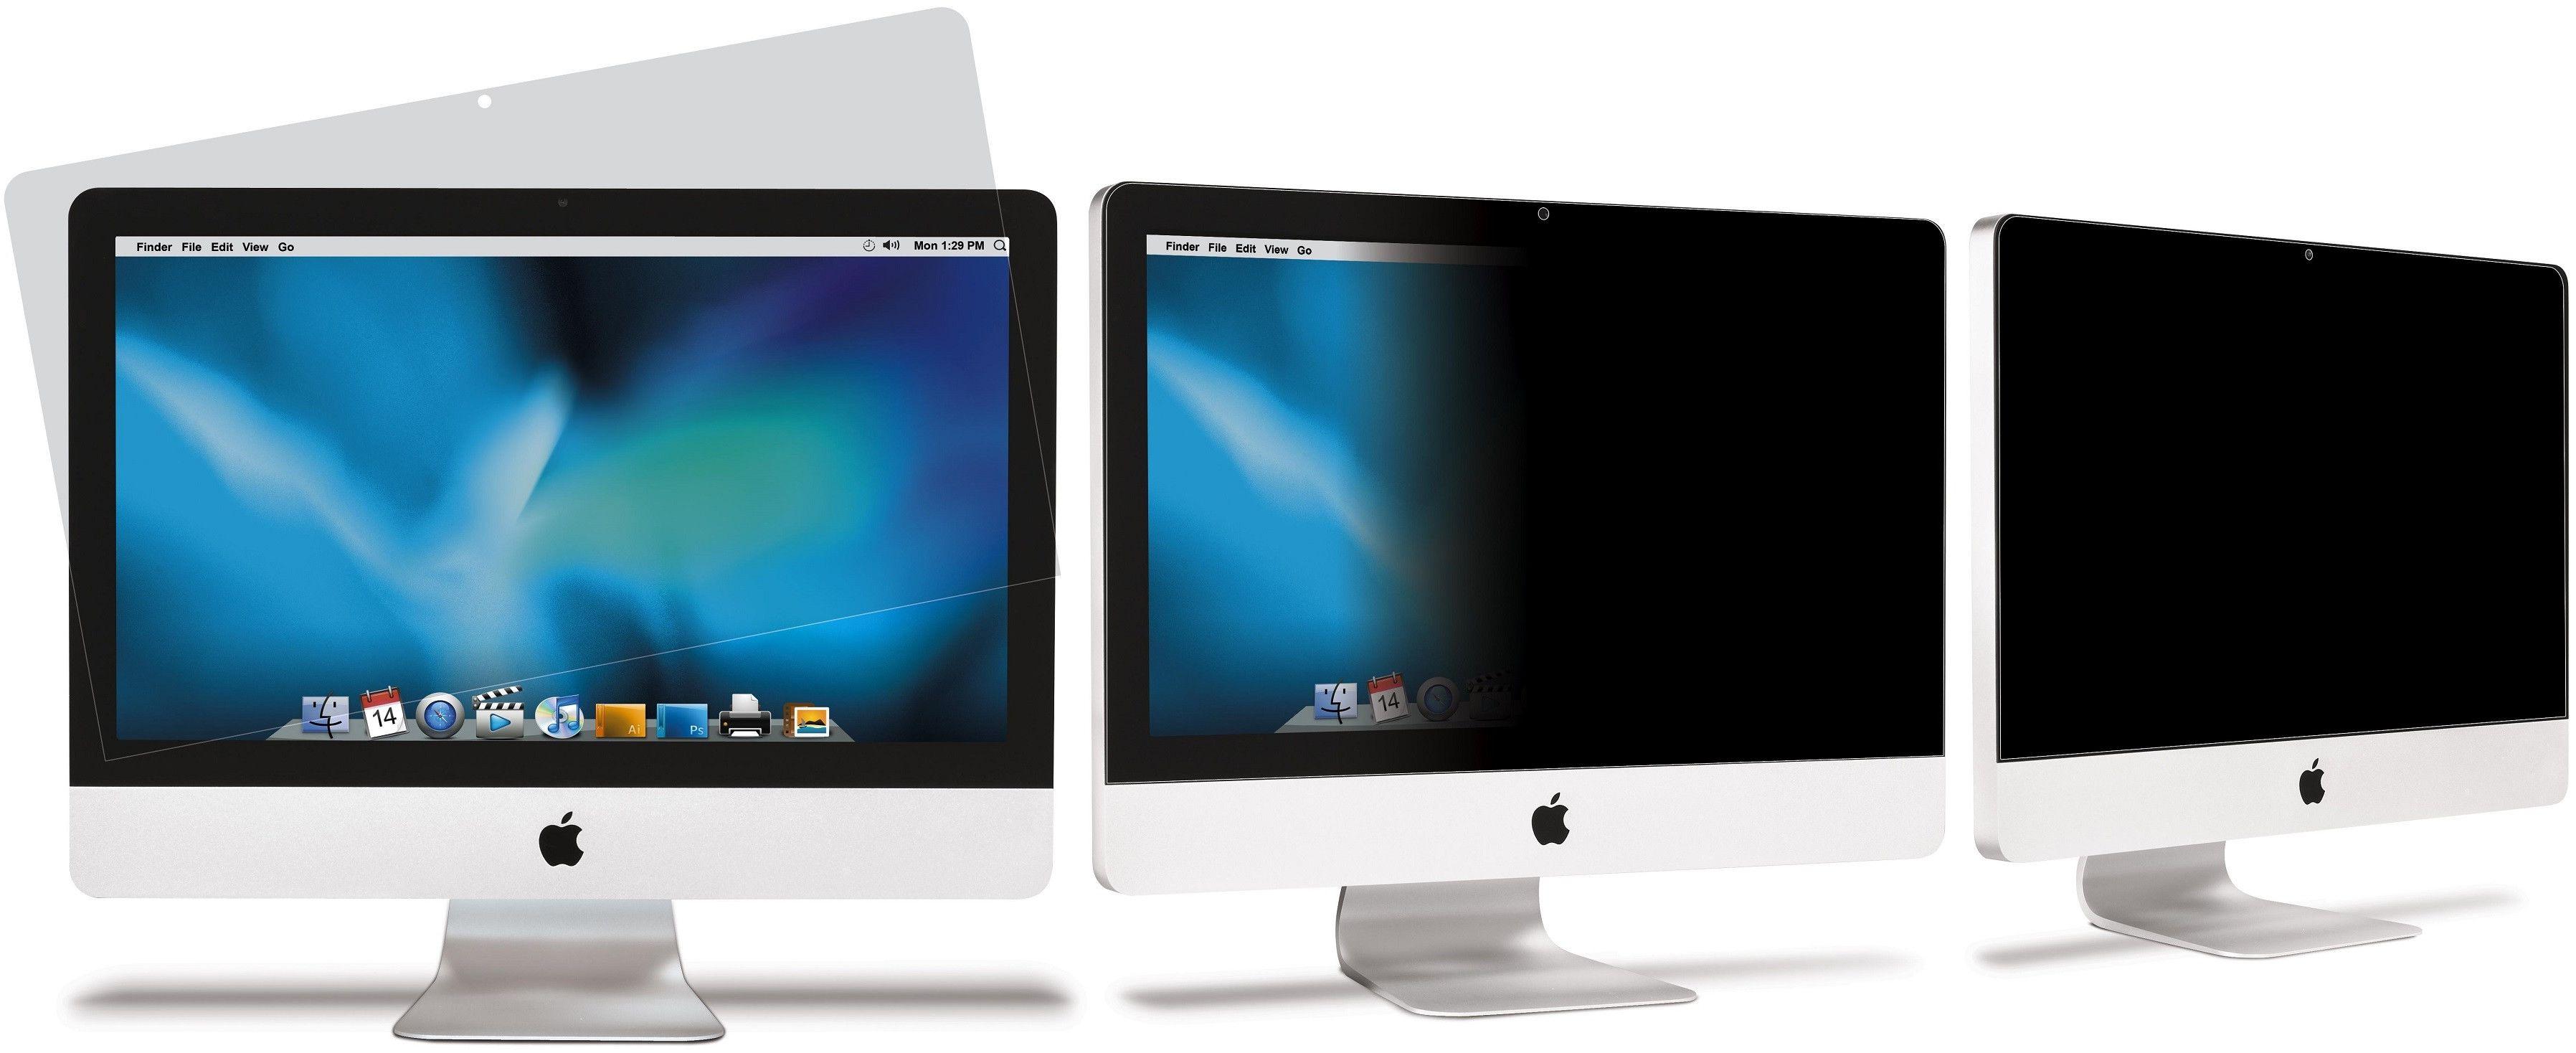 "Filtr Prywatyzujący 3M  PFIM27v2 do monitora PFMP27 Apple  27"" iMac  DYSTRYBUTOR 3M 98044058091"